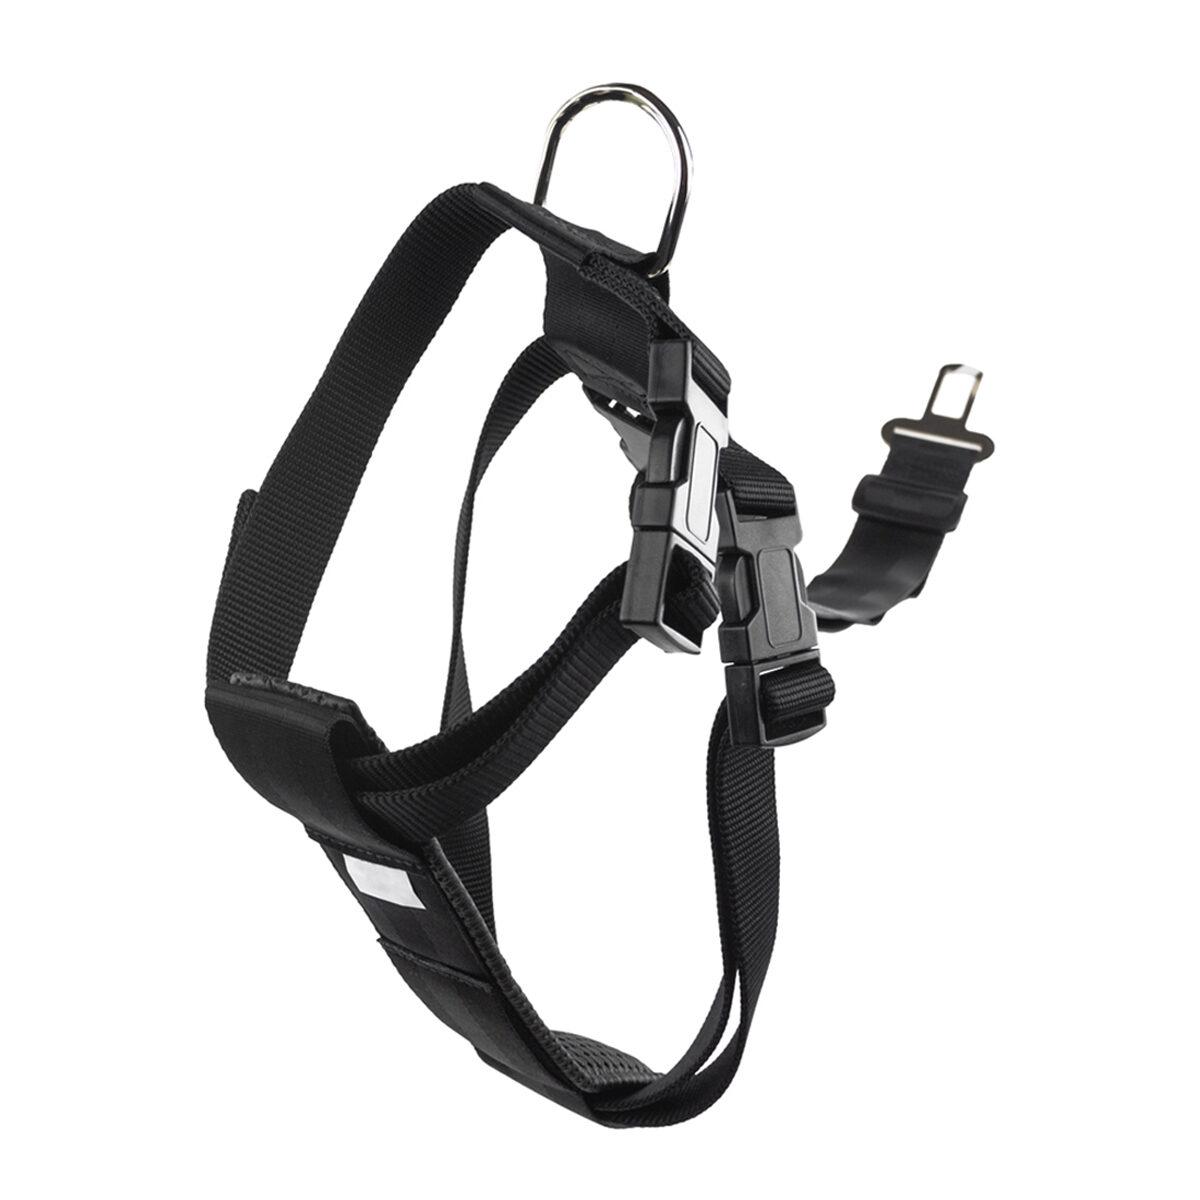 Veiligheidstuig Nylon 25mm Hondentuigje 75x90cm Zwart